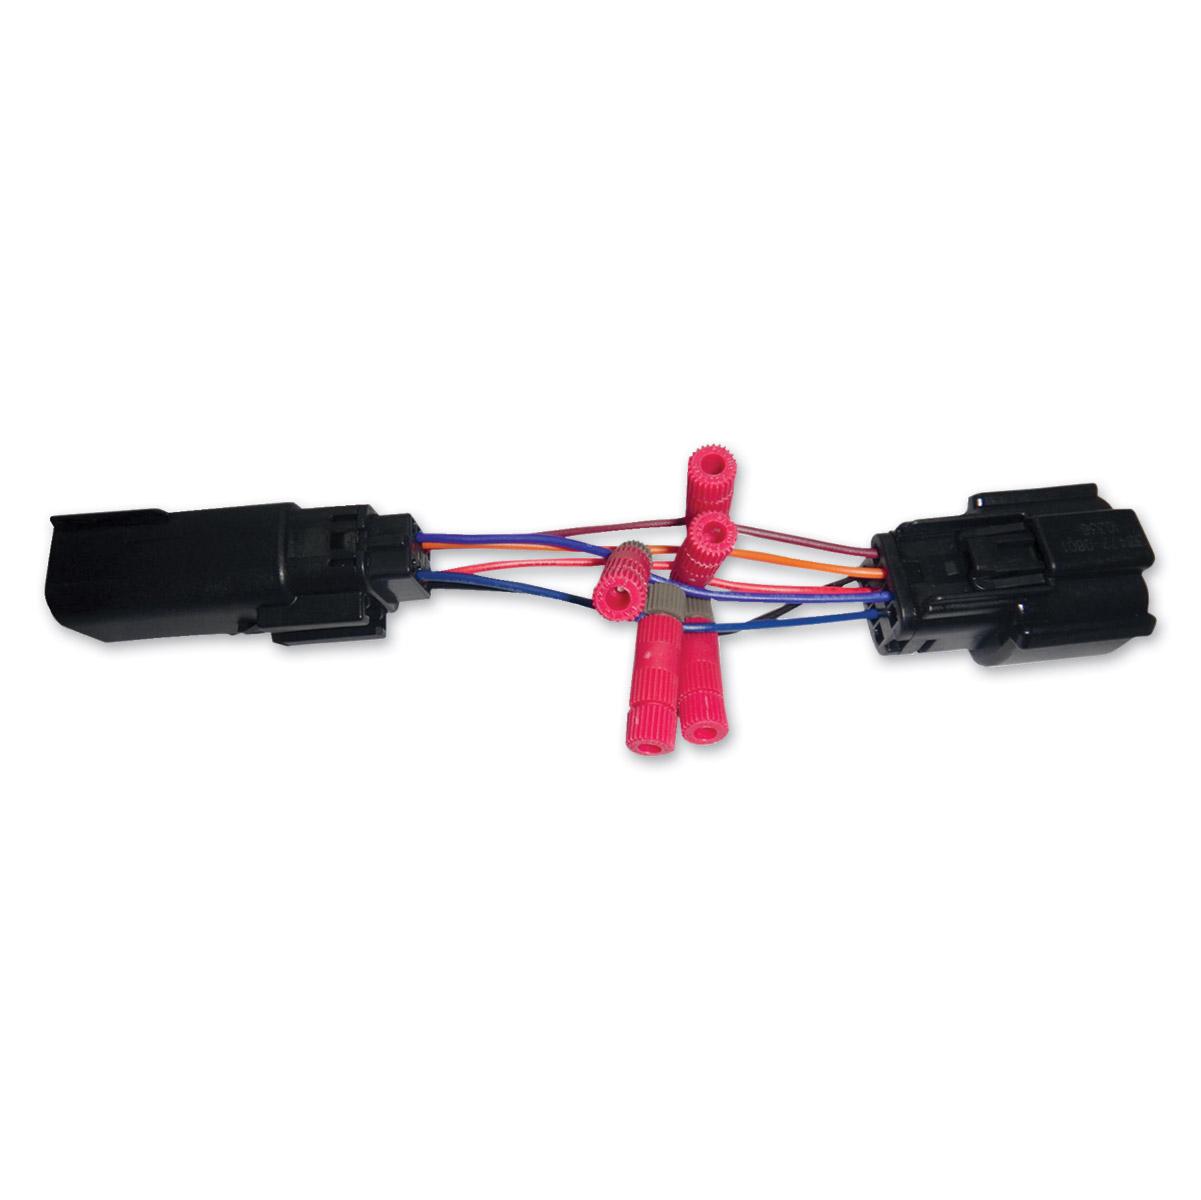 Custom Dynamics Plasma Rod Brake Light Adapter